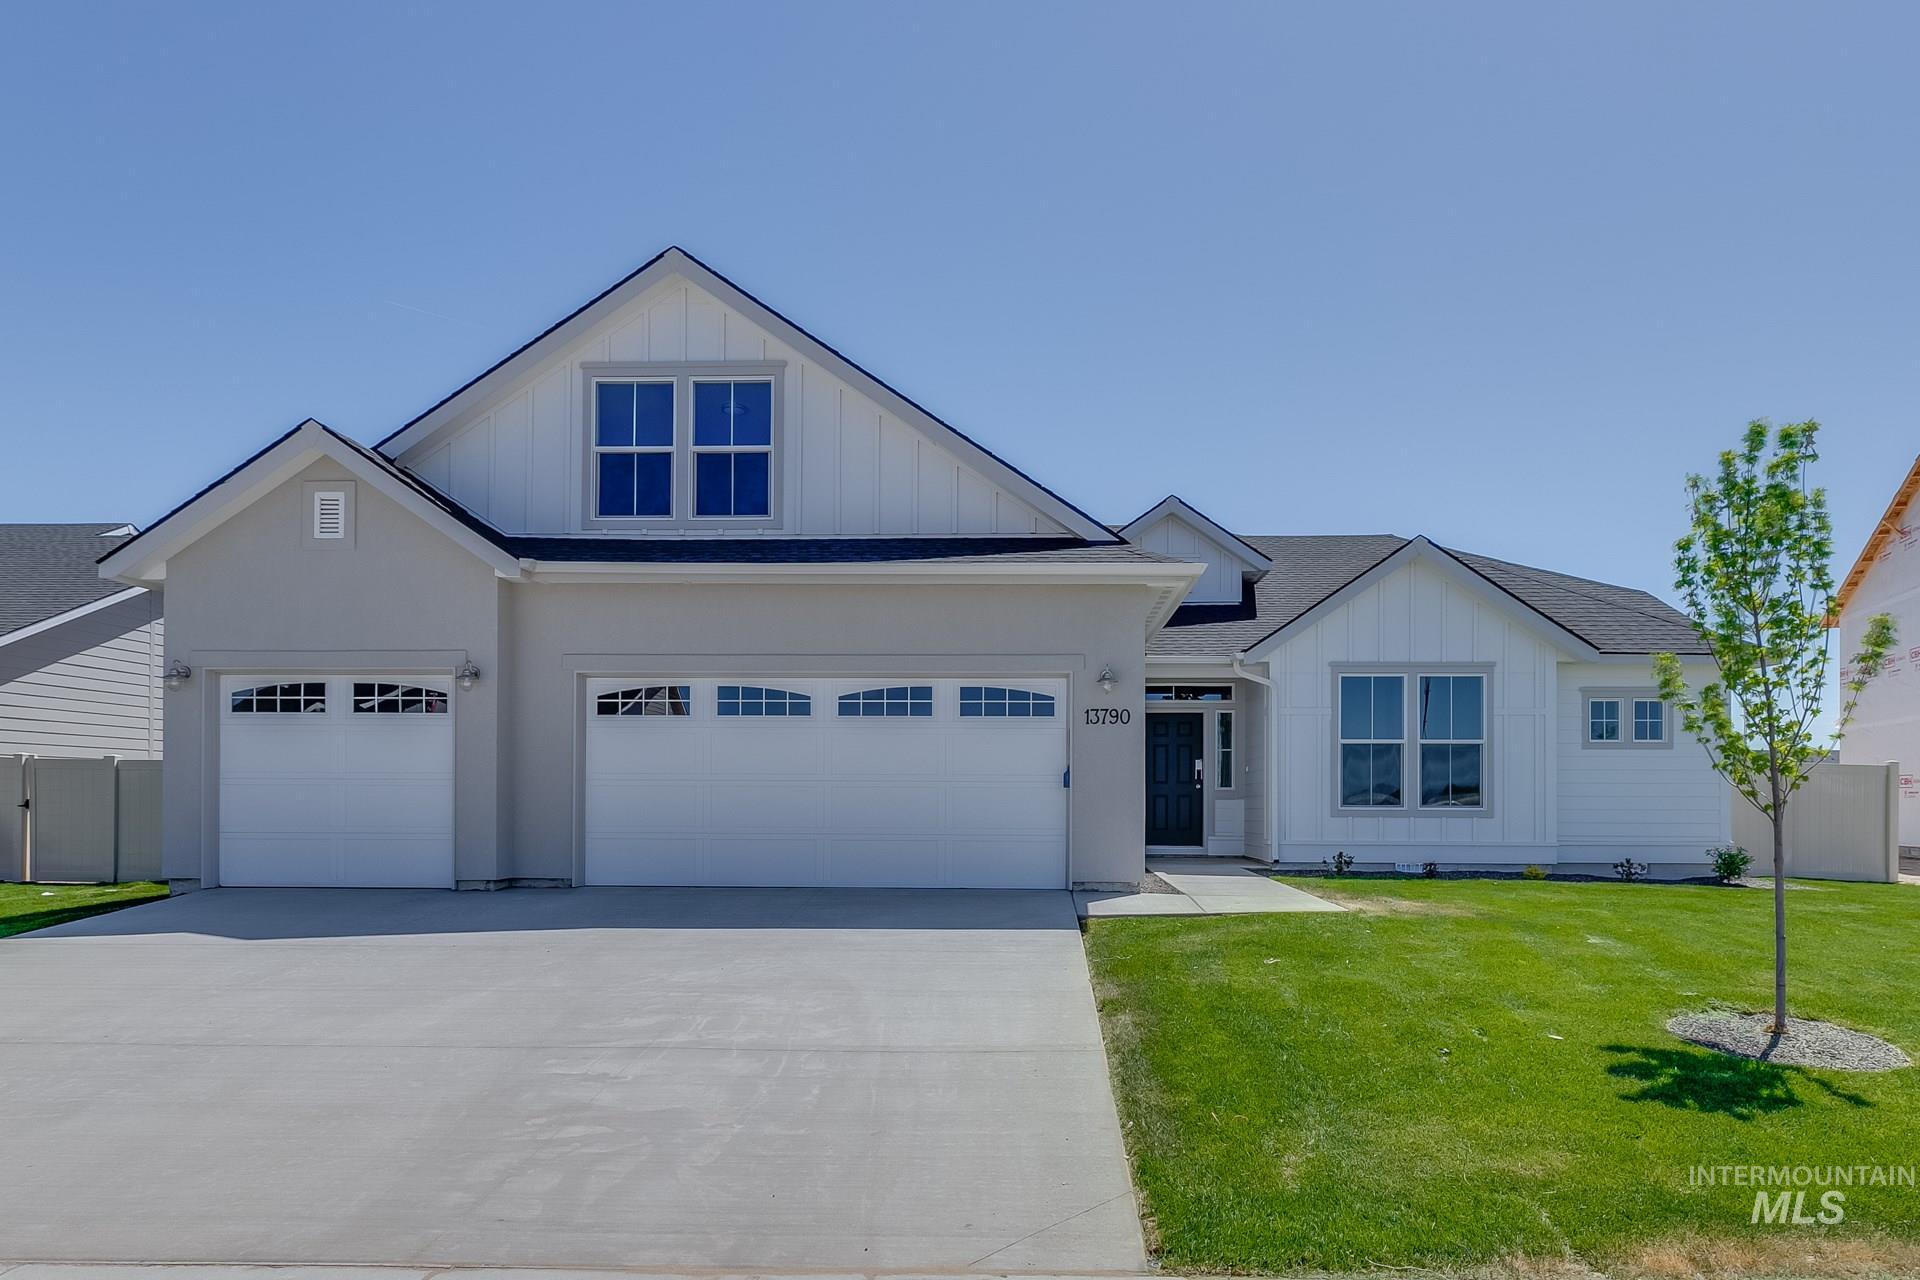 13665 S Baroque Ave Property Photo